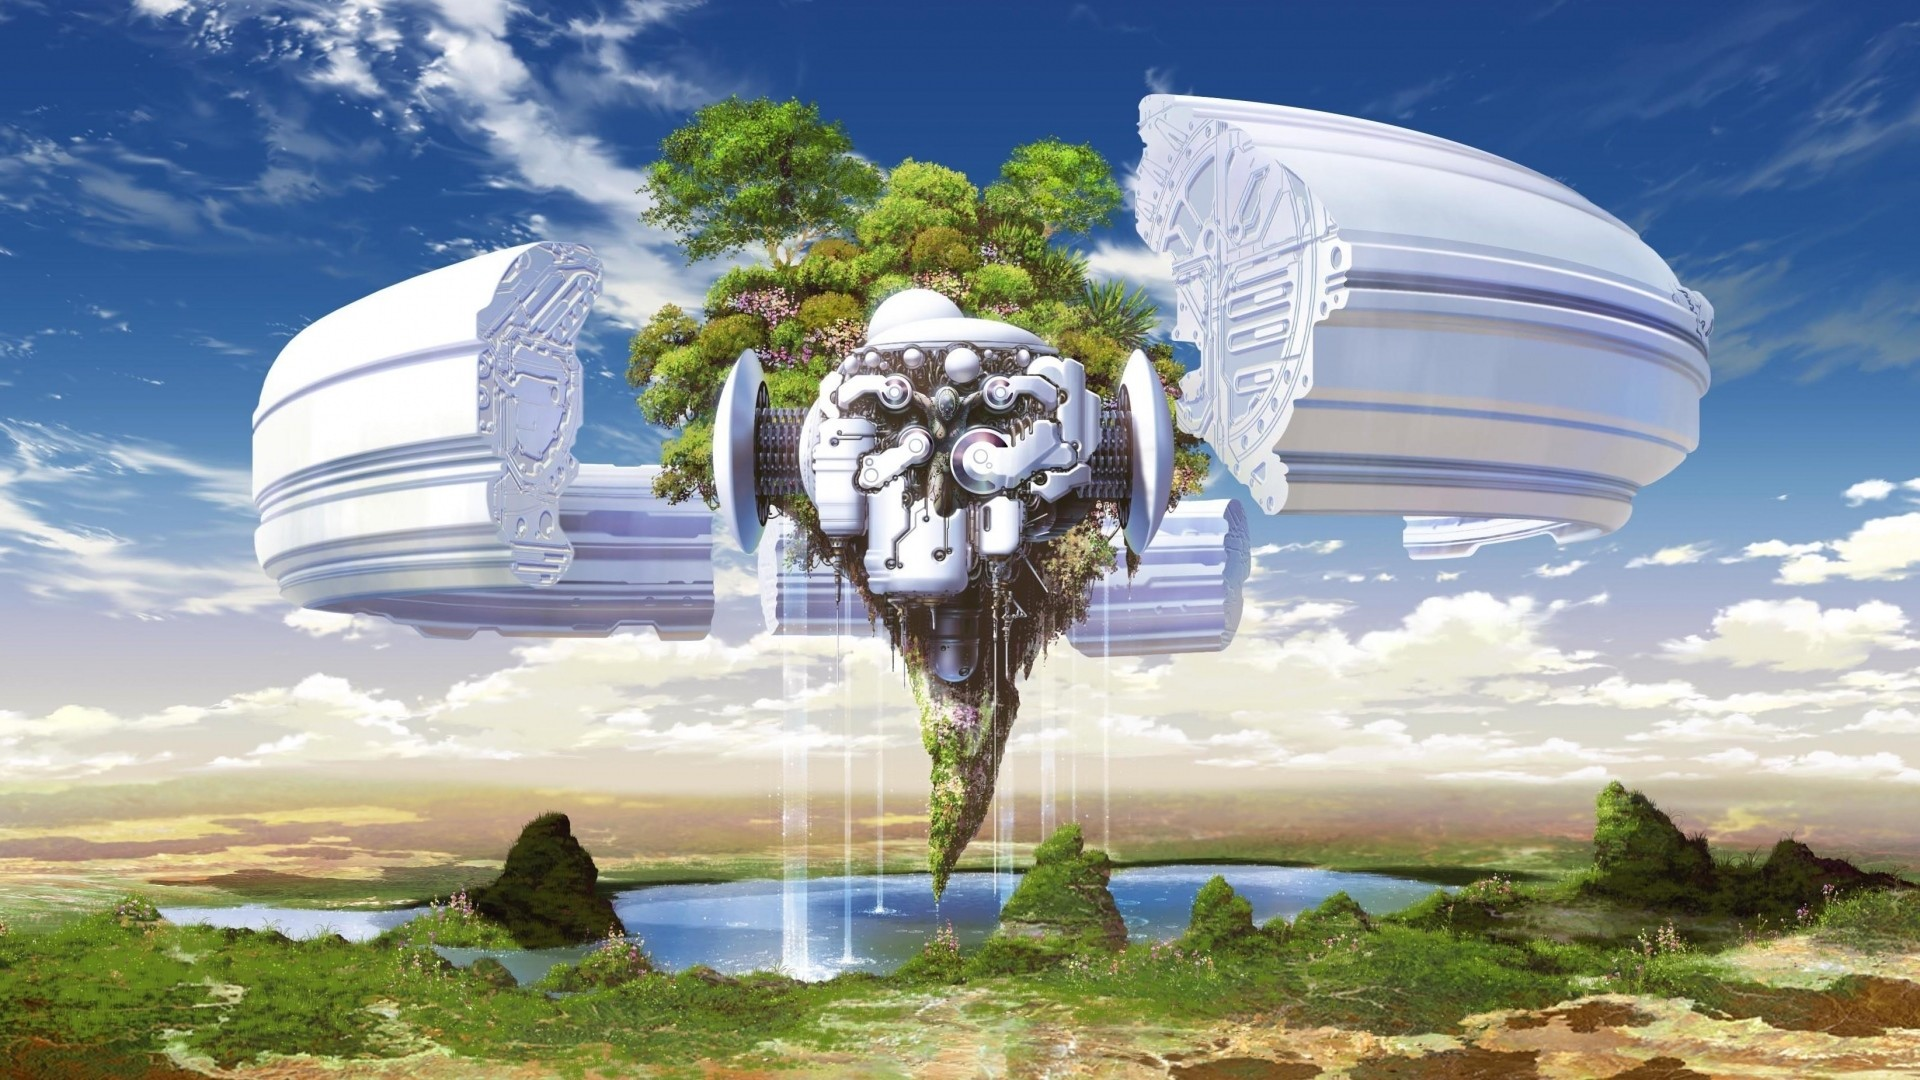 Download Wallpaper Trees, Land, Piece, Weightlessness, Mechanism,  Sky, Water